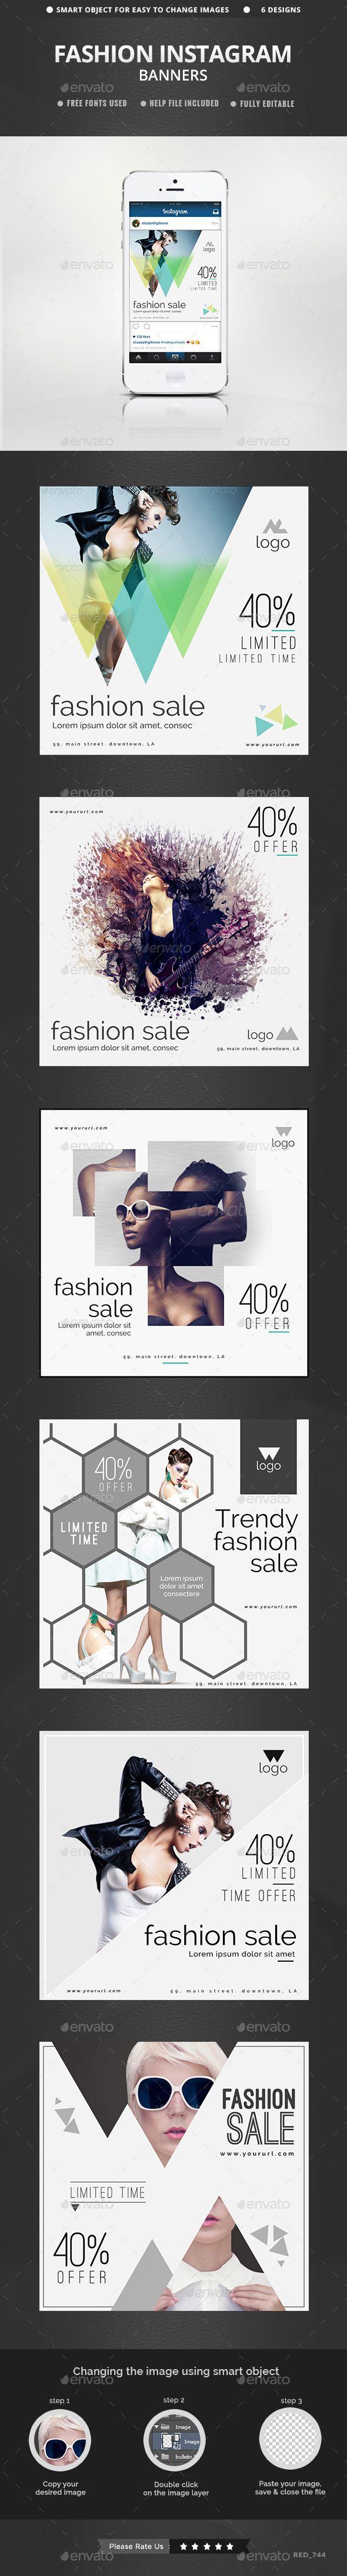 Fashion Instagram Templates - 6 Designs PSD #design #ads Download: http://graphicriver.net/item/fashion-instagram-templates-6-designs/13240525?ref=ksioks